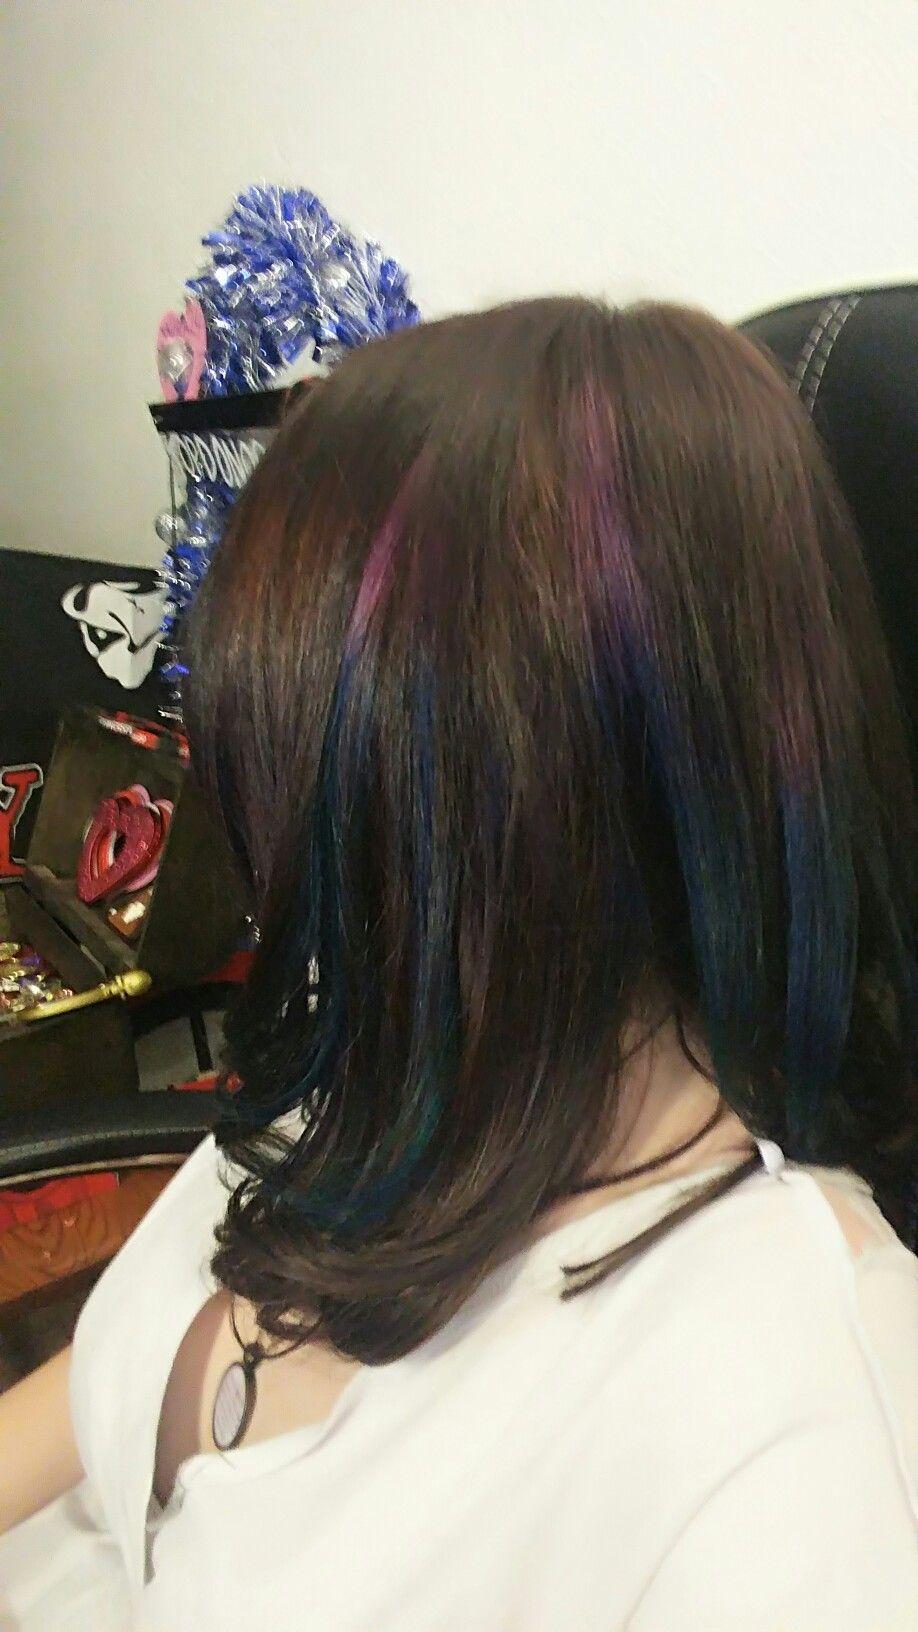 My new Peekaboo oilslick or peacock hair highlights!